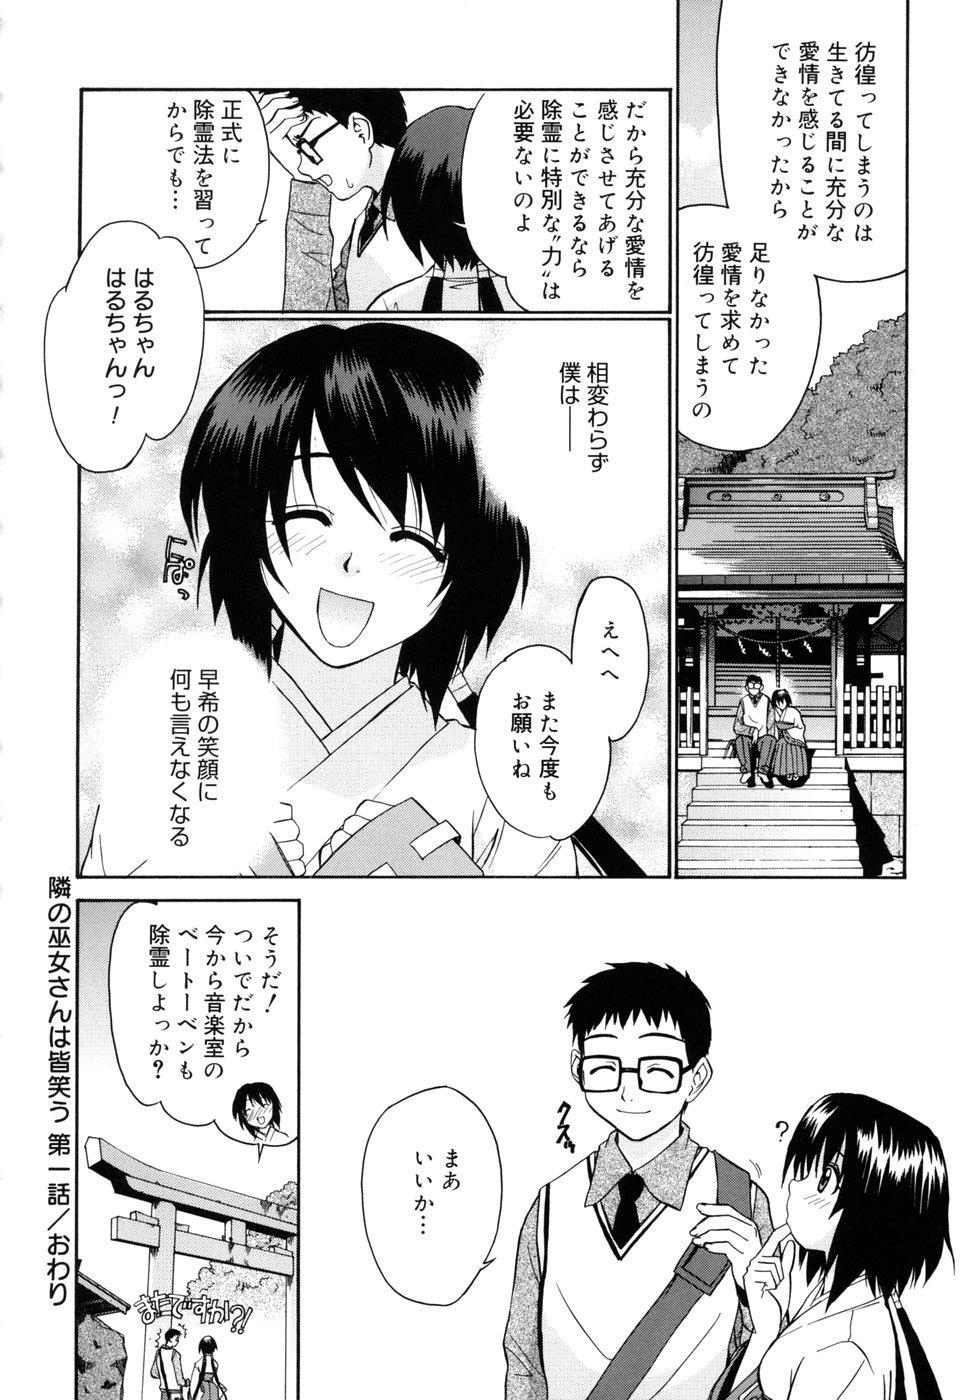 [Yaya Hinata] Tonari no Miko-san wa Minna Warau - The next shrine maidens smile in everyone. 21